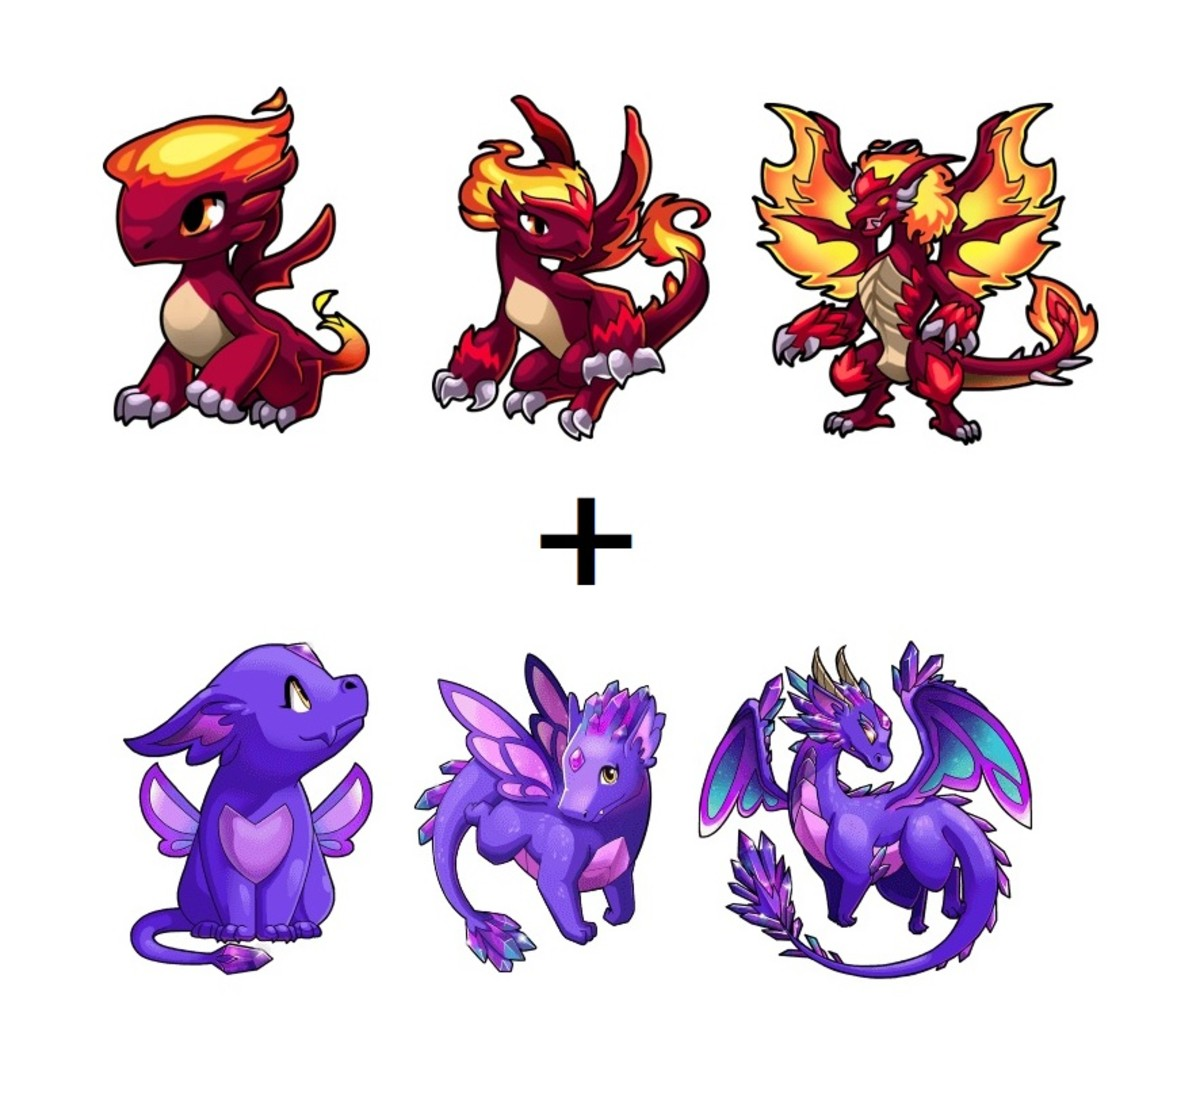 everwing-best-sidekick-dragon-combinations